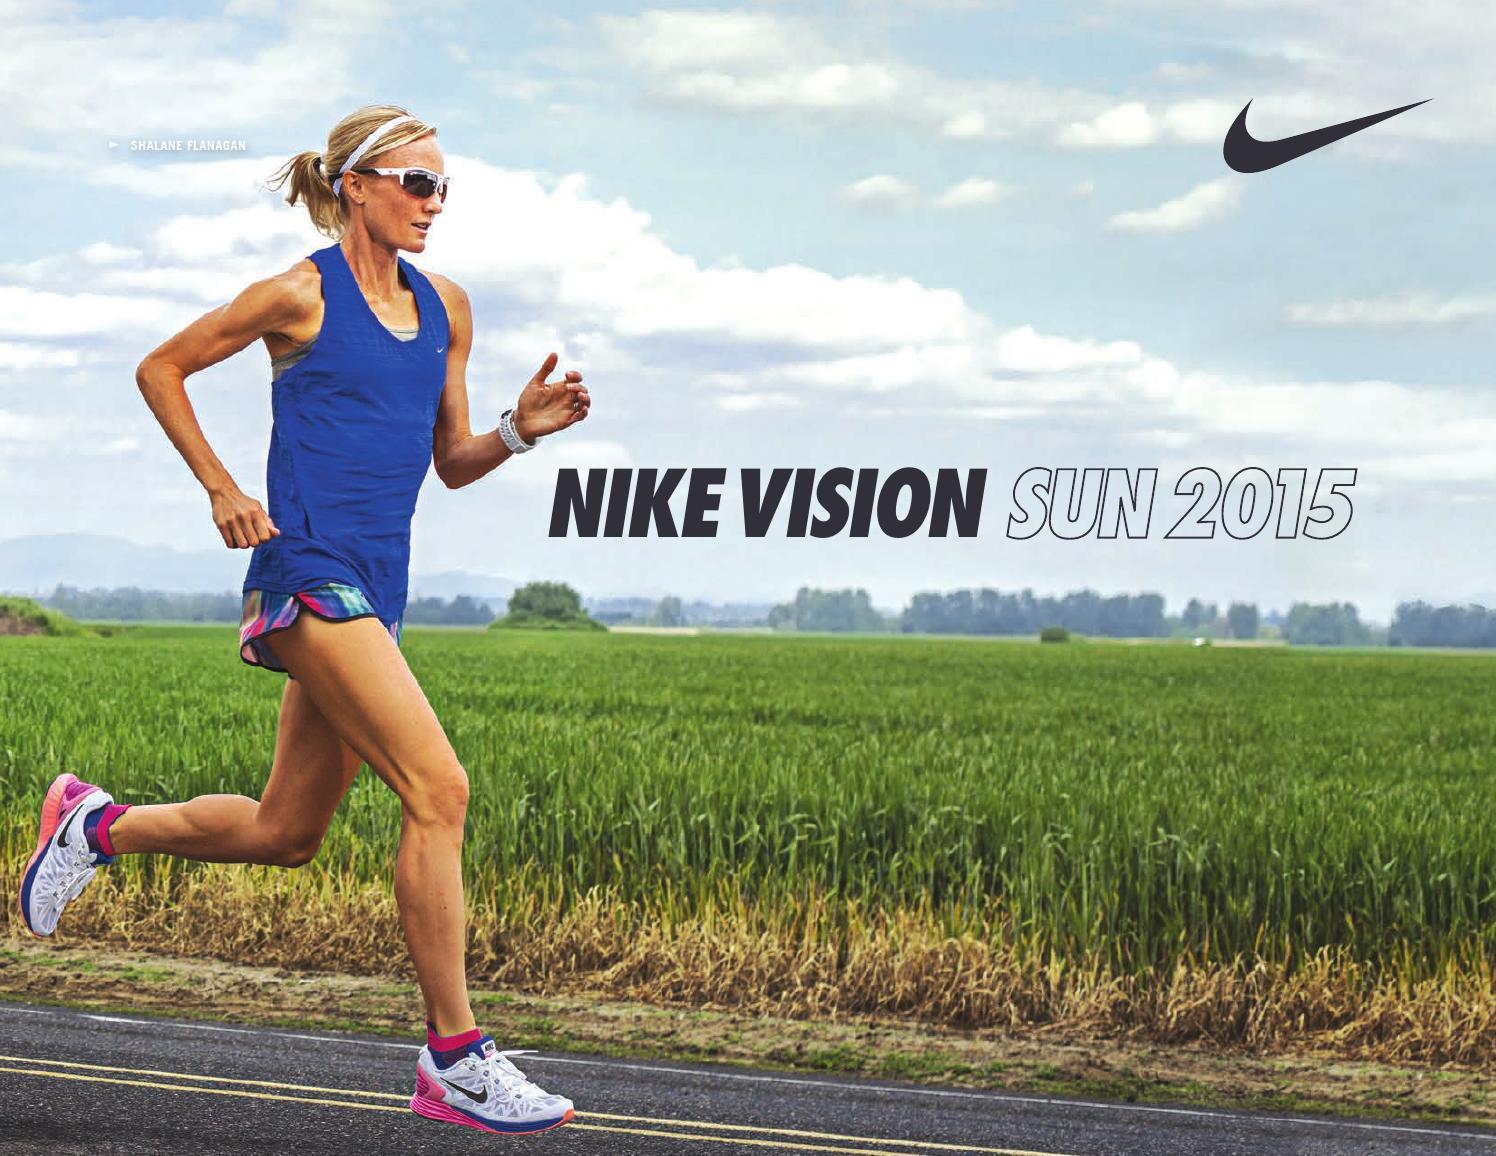 8735bc818dc Nike vision 2015 by zuzupopo - issuu